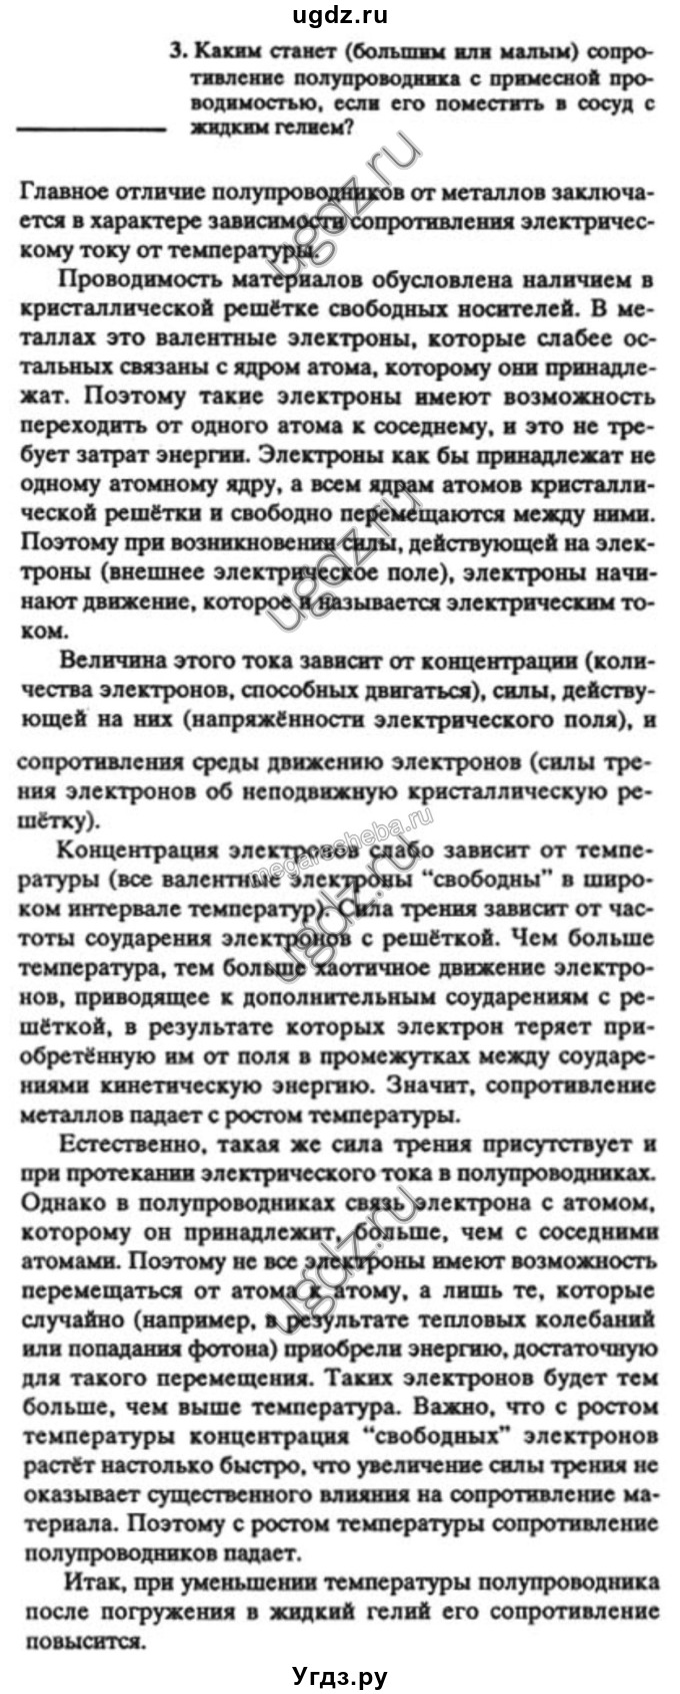 Шахмаев класс бунчук по гдз физике решебник 8